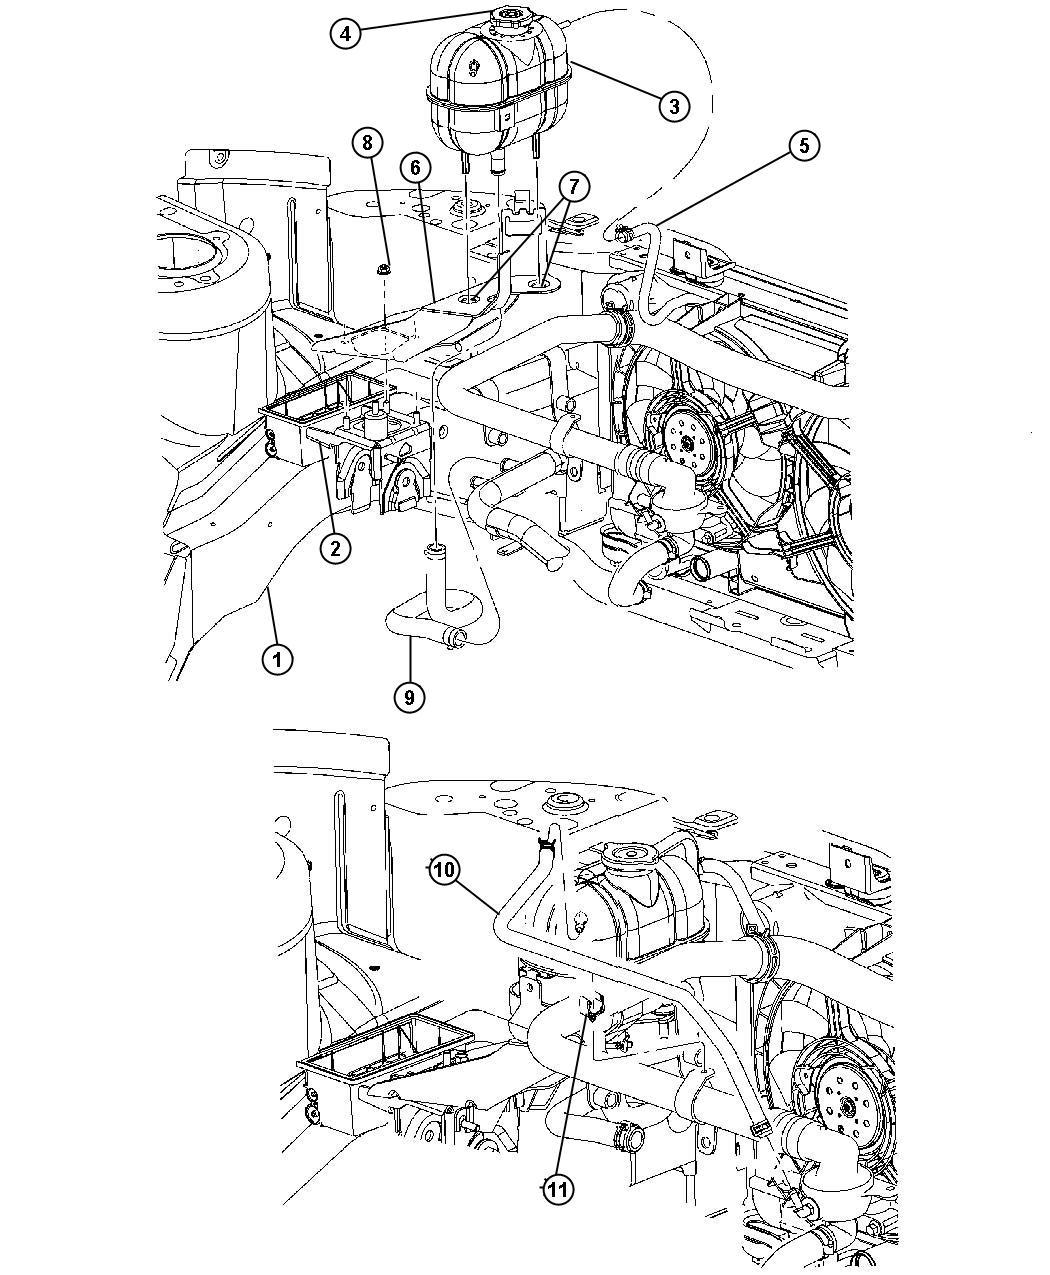 Dodge Ram Bottle Pressurized Coolant Includes